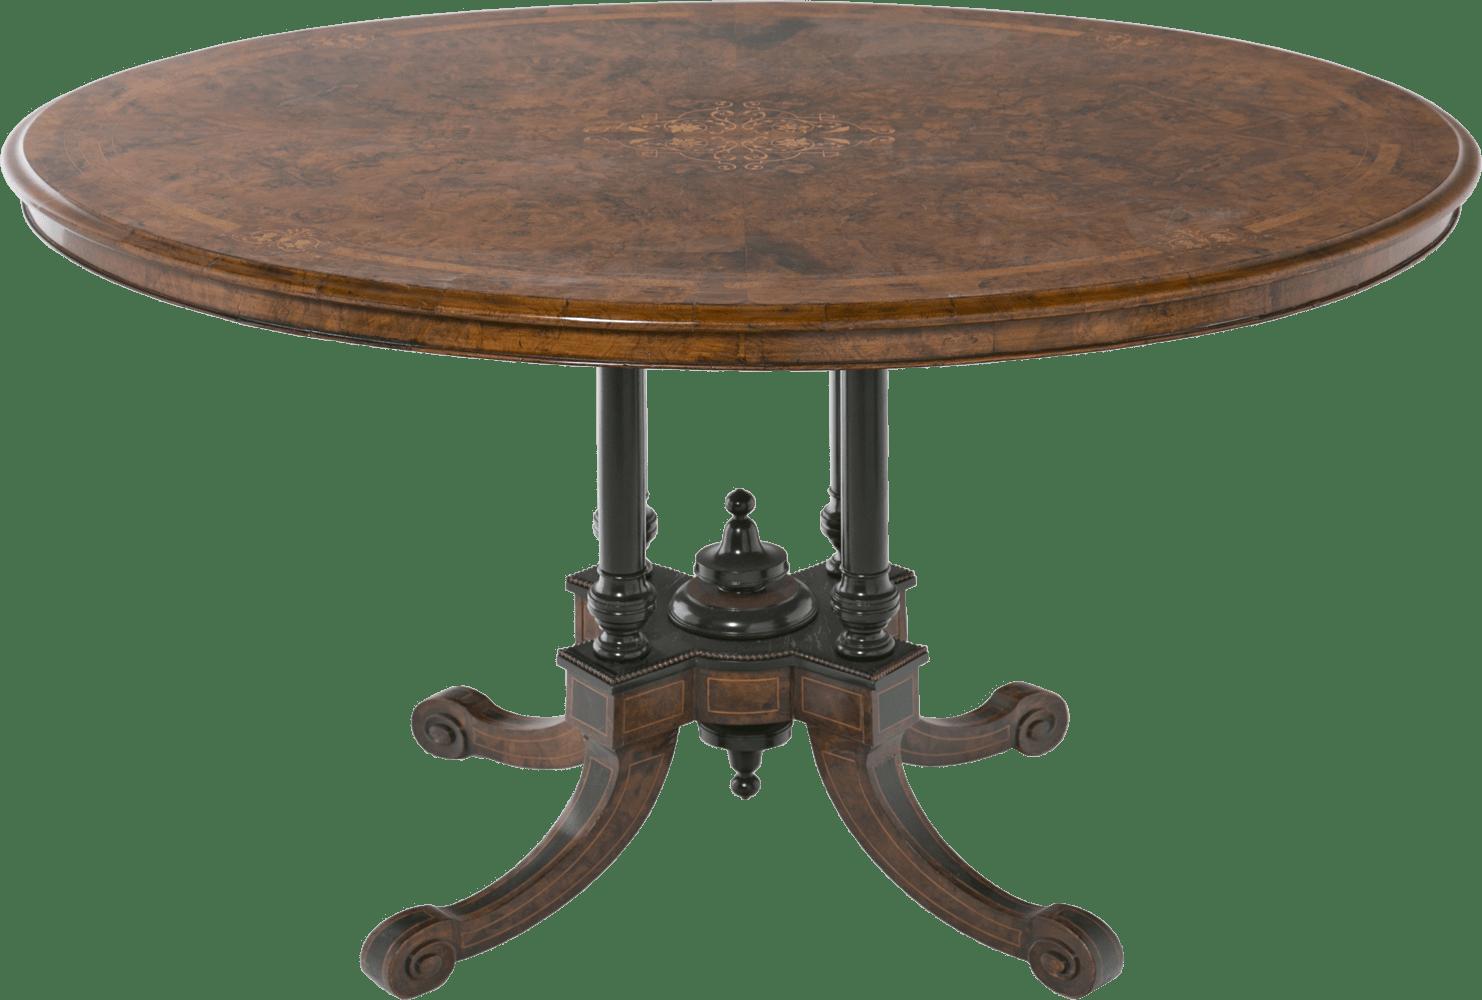 Antique Wooden Table transparent PNG.